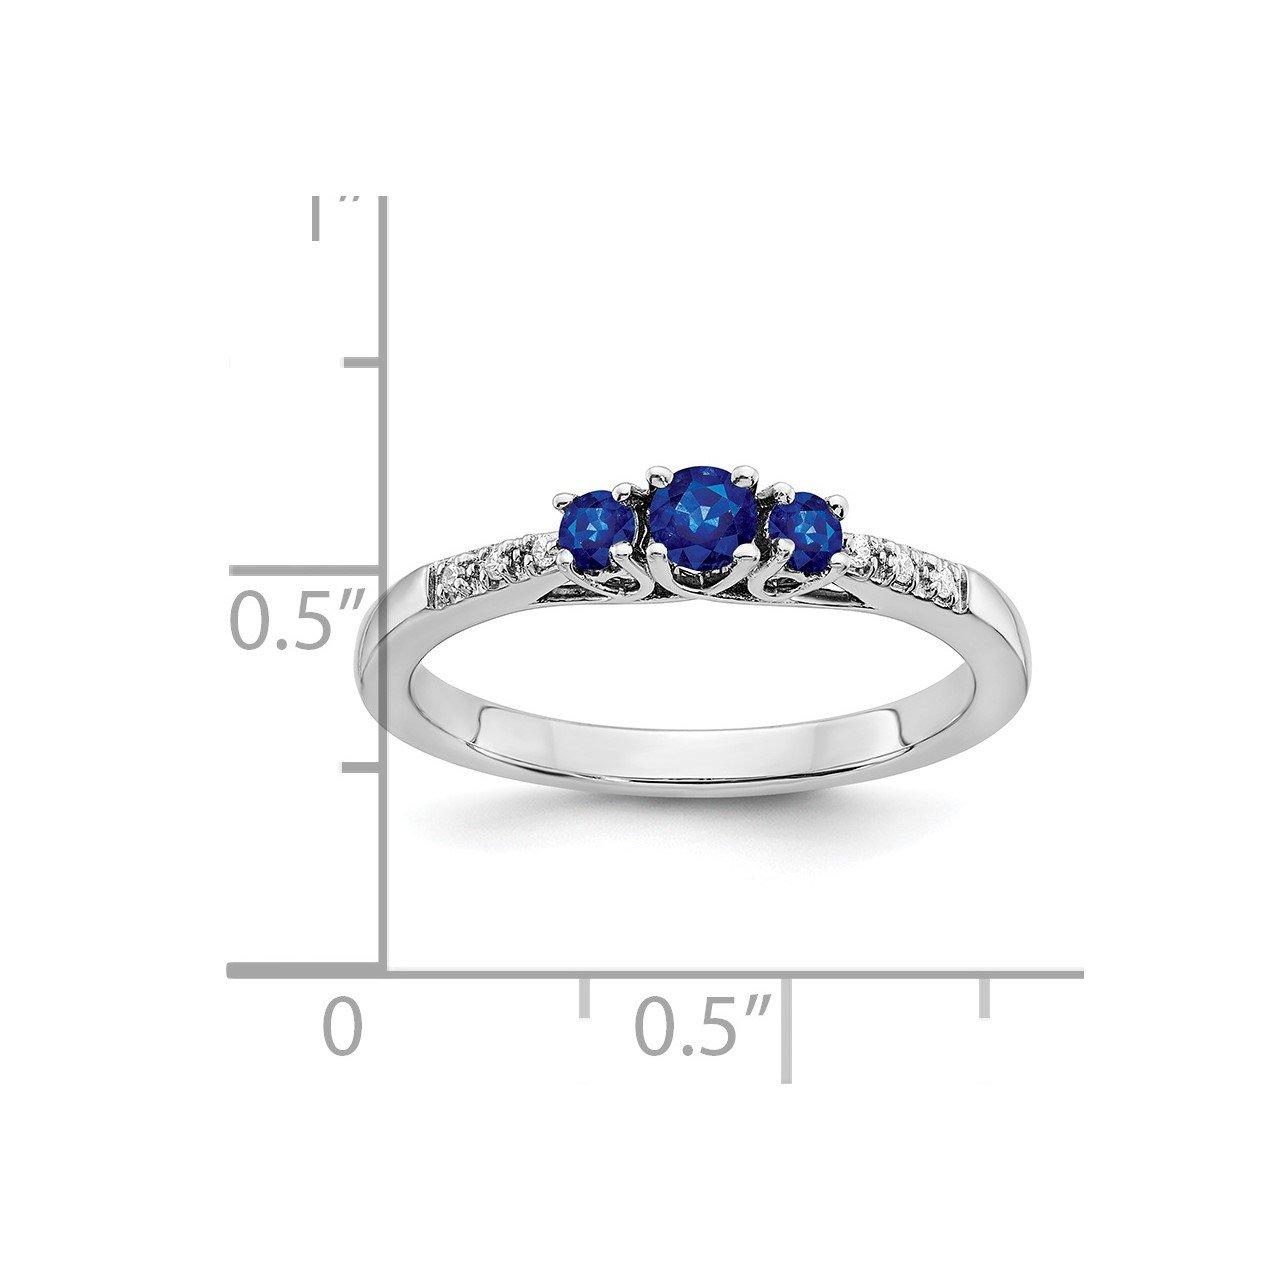 14k White Gold Sapphire and Diamond 3-stone Ring-2